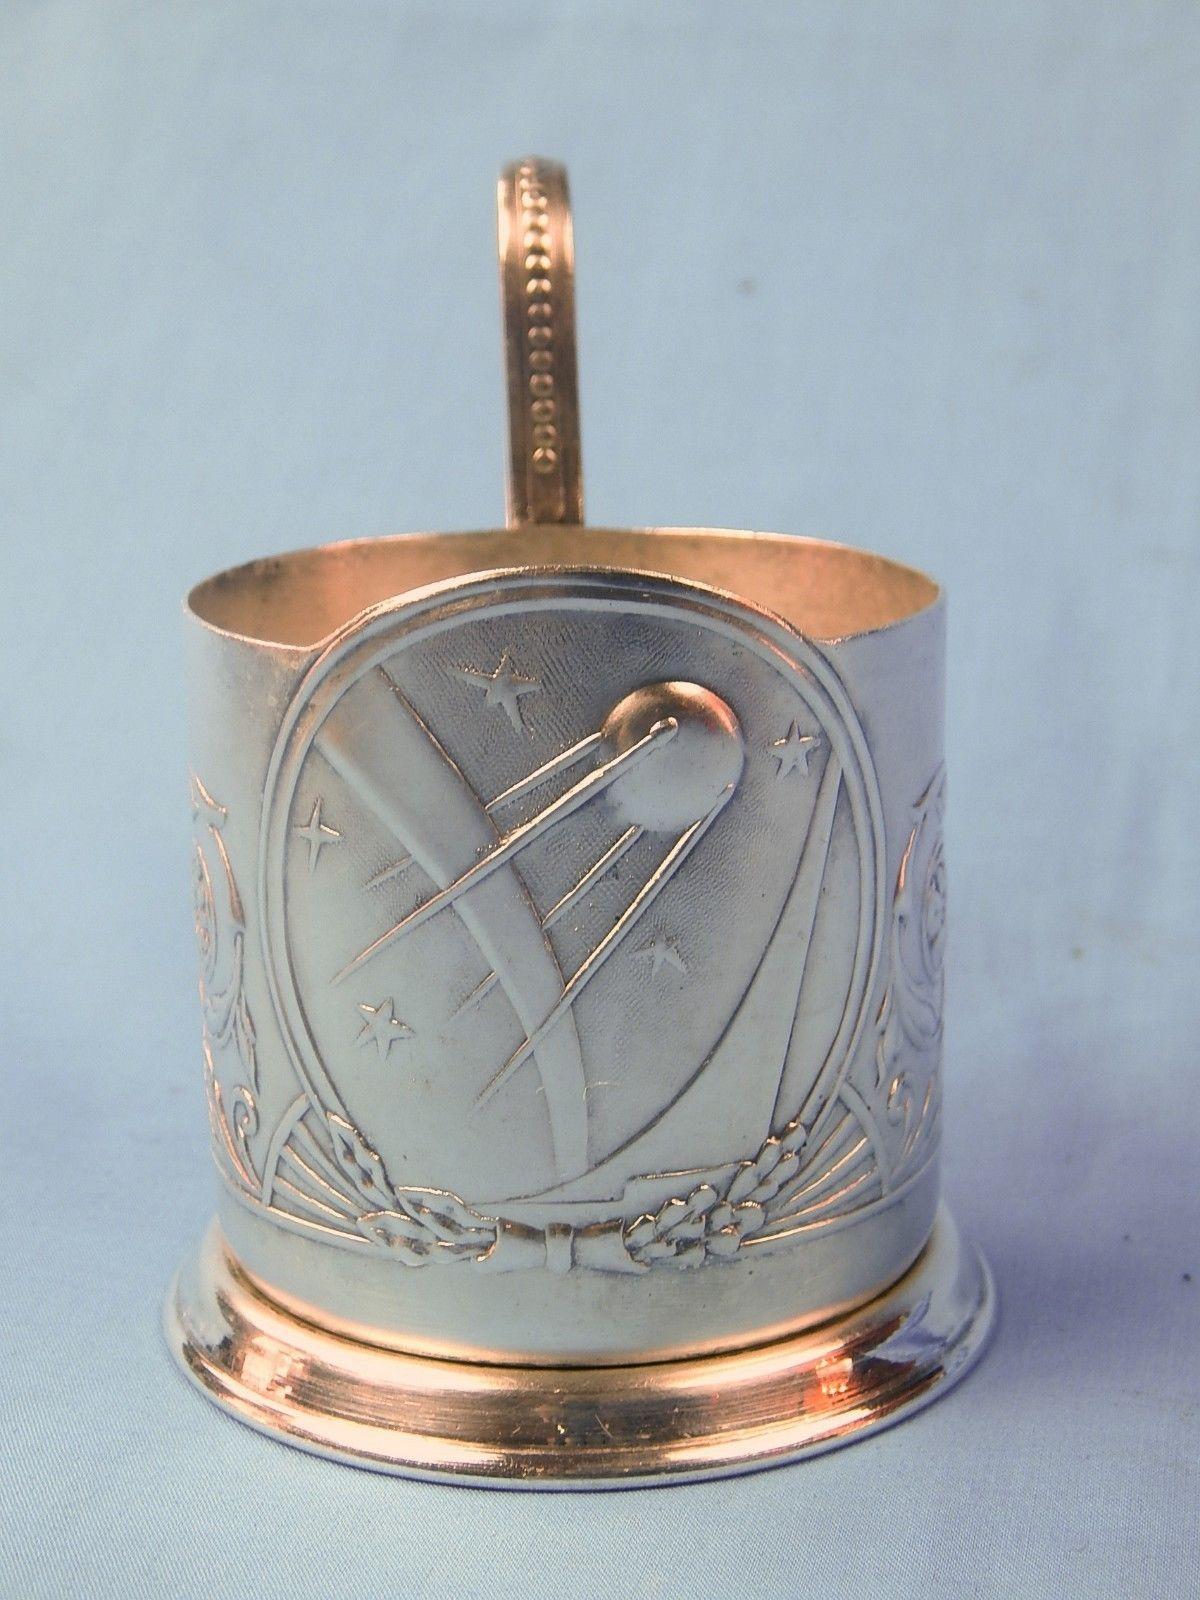 Vintage tea glass holder with ship Soviet glass holder Soviet memorabilia Soviet podstakannik Made in USSR Vintage kitchen russian antiques